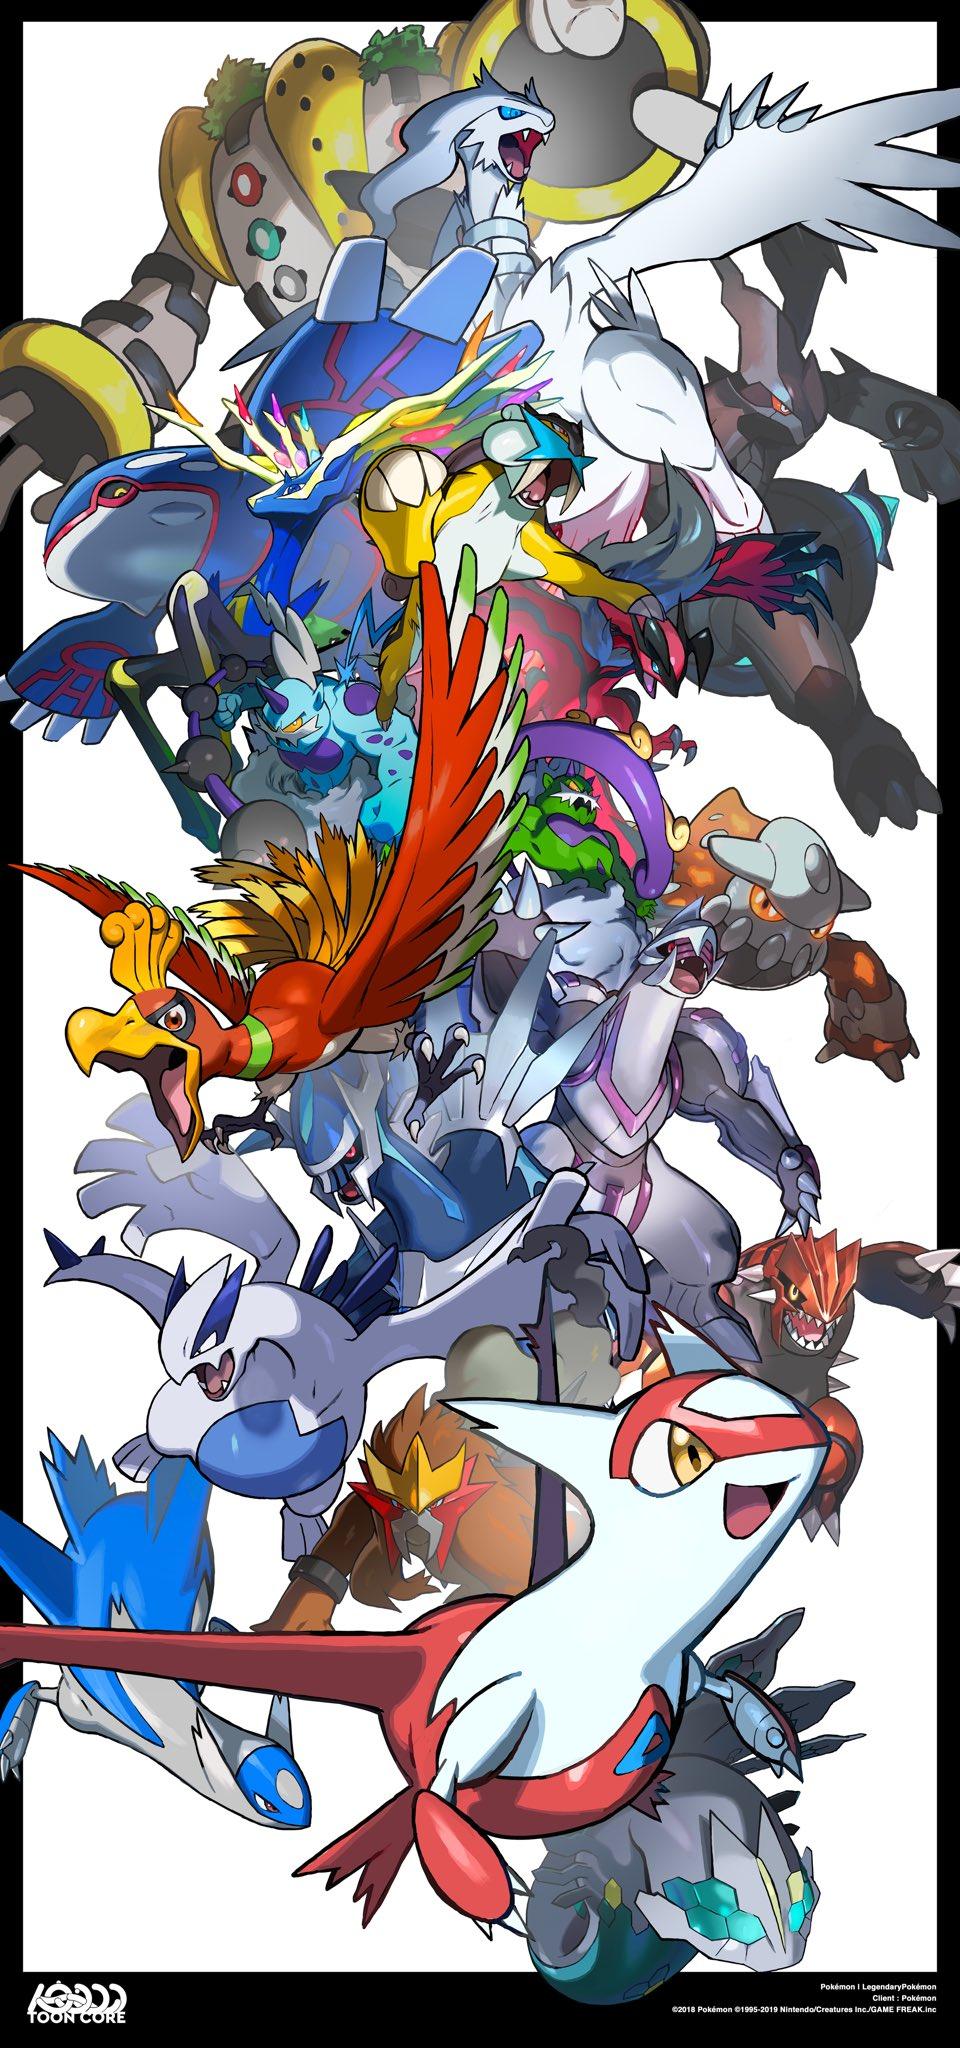 alternate_color creatures_(company) credits dialga entei game_freak gen_2_pokemon gen_3_pokemon gen_4_pokemon gen_5_pokemon gen_6_pokemon groudon heatran highres ho-oh kyogre latias latios legendary_pokemon lugia nintendo no_humans palkia pokemon pokemon_(creature) pokemon_(game) raikou regigigas reshiram shiny_pokemon thundurus tokiya tornadus xerneas yveltal zekrom zygarde zygarde_50_percent